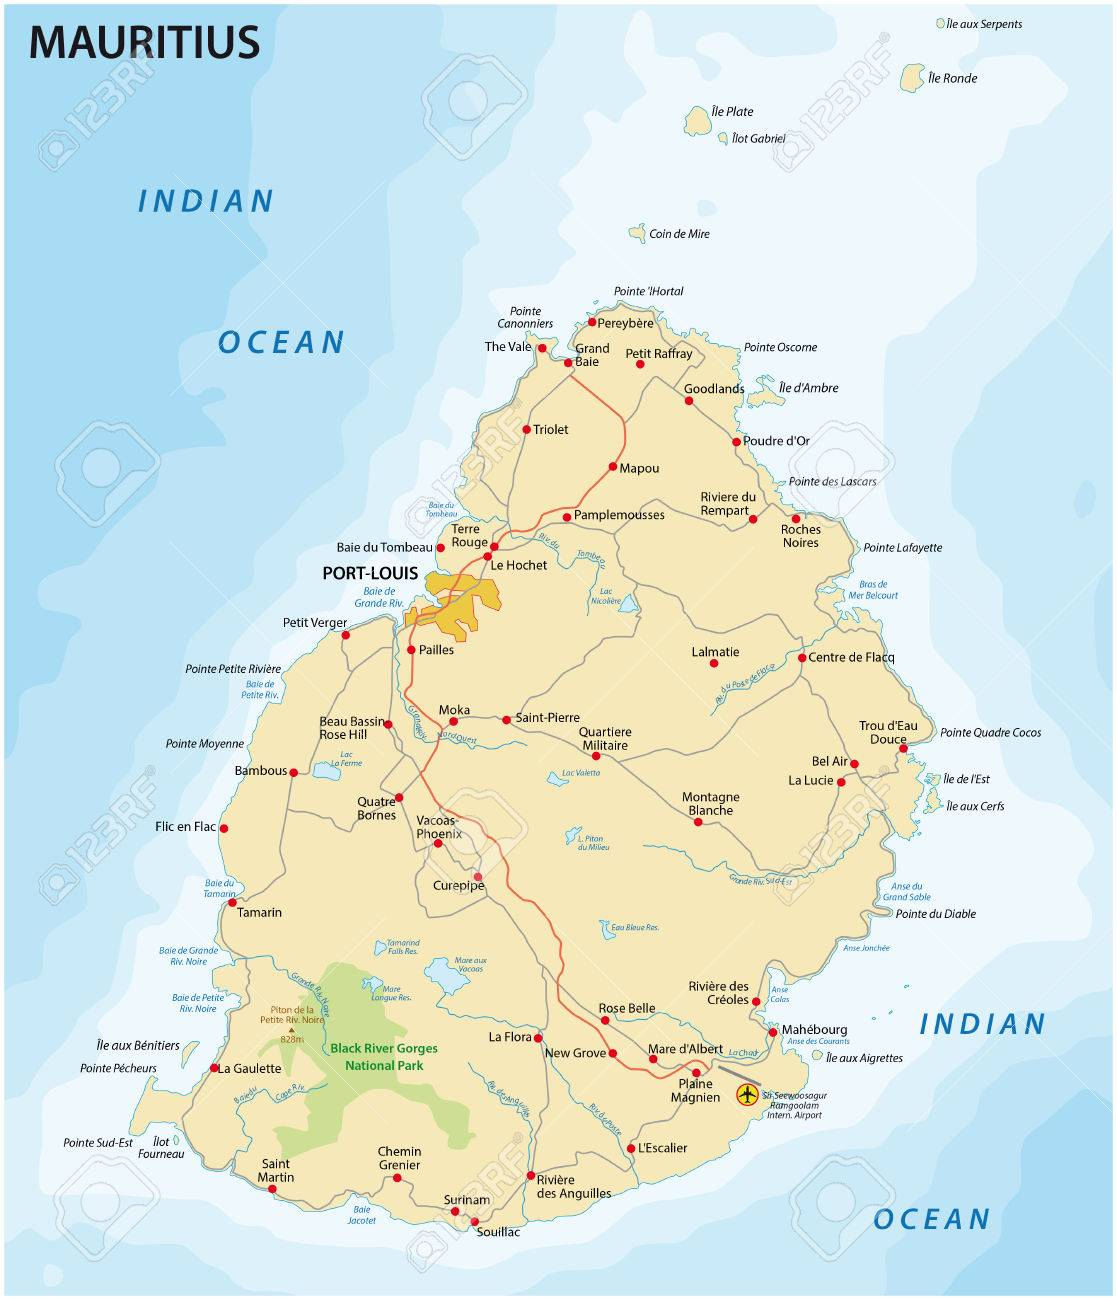 Carte Routiere Ile Maurice.Carte Routiere De L Etat Islande Ile Maurice Dans L Ocean Indien